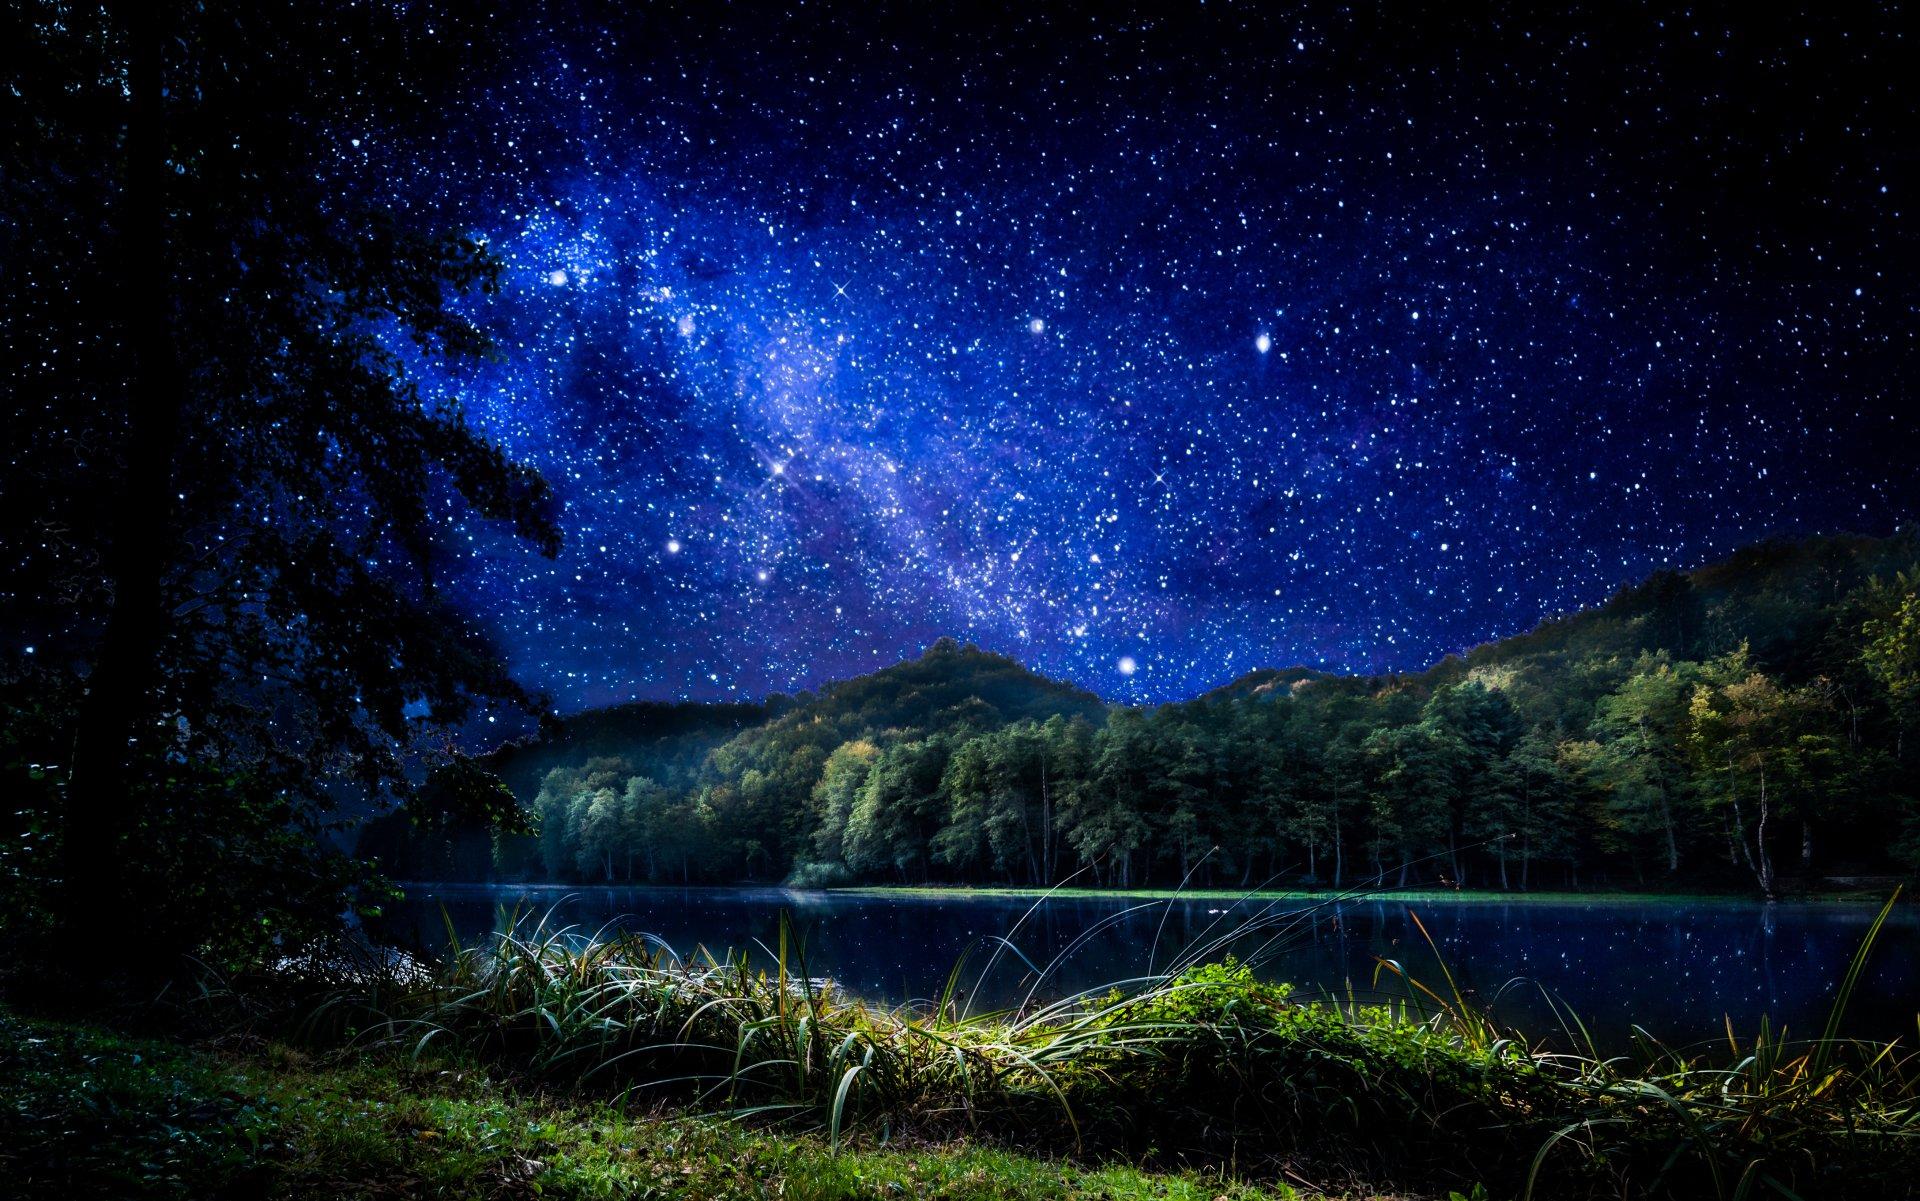 Starry sky over mountain and lake 4k ultra hd wallpaper - Night mountain wallpaper 4k ...